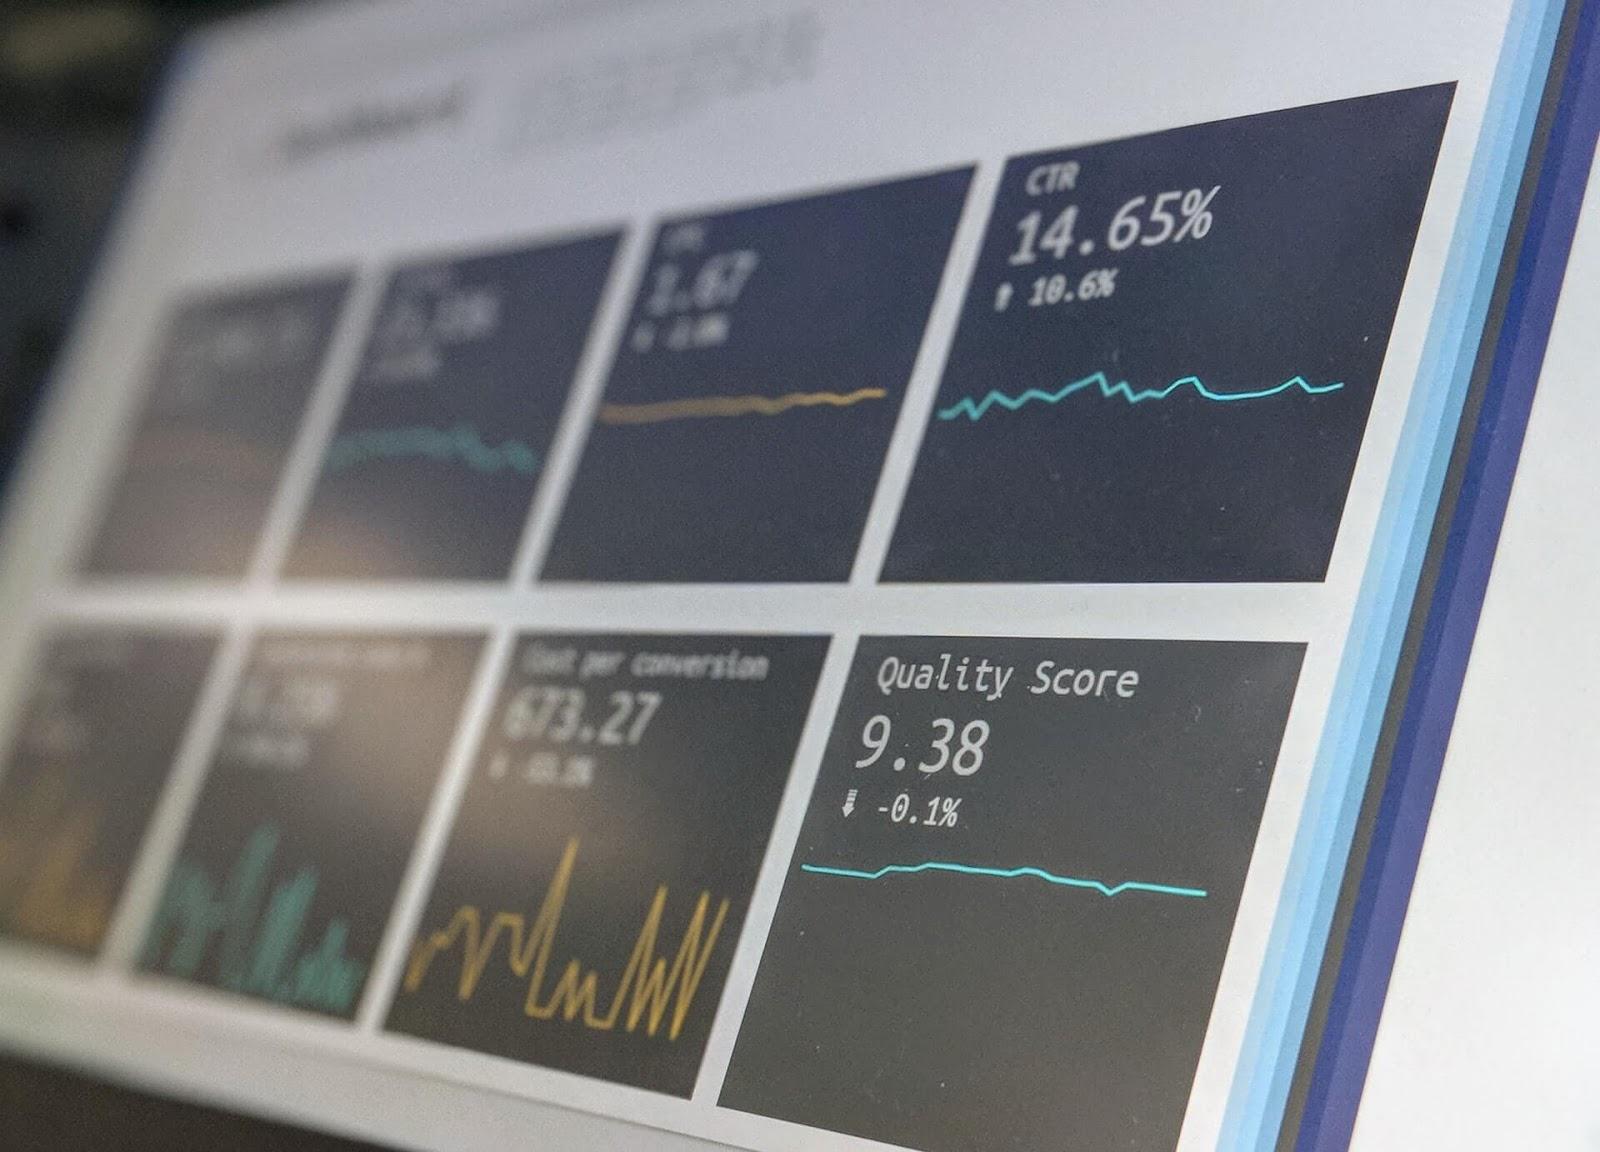 seo metrics on laptop screen